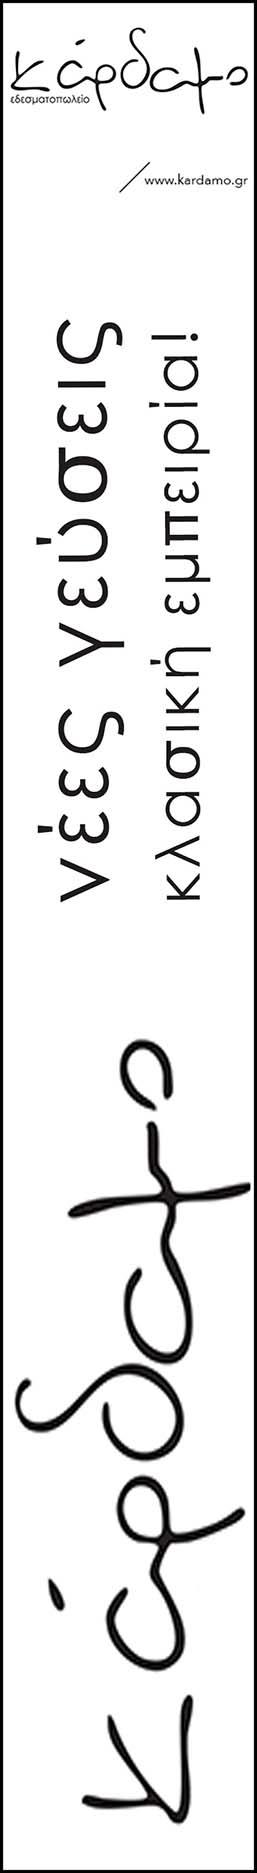 side banner kardamo